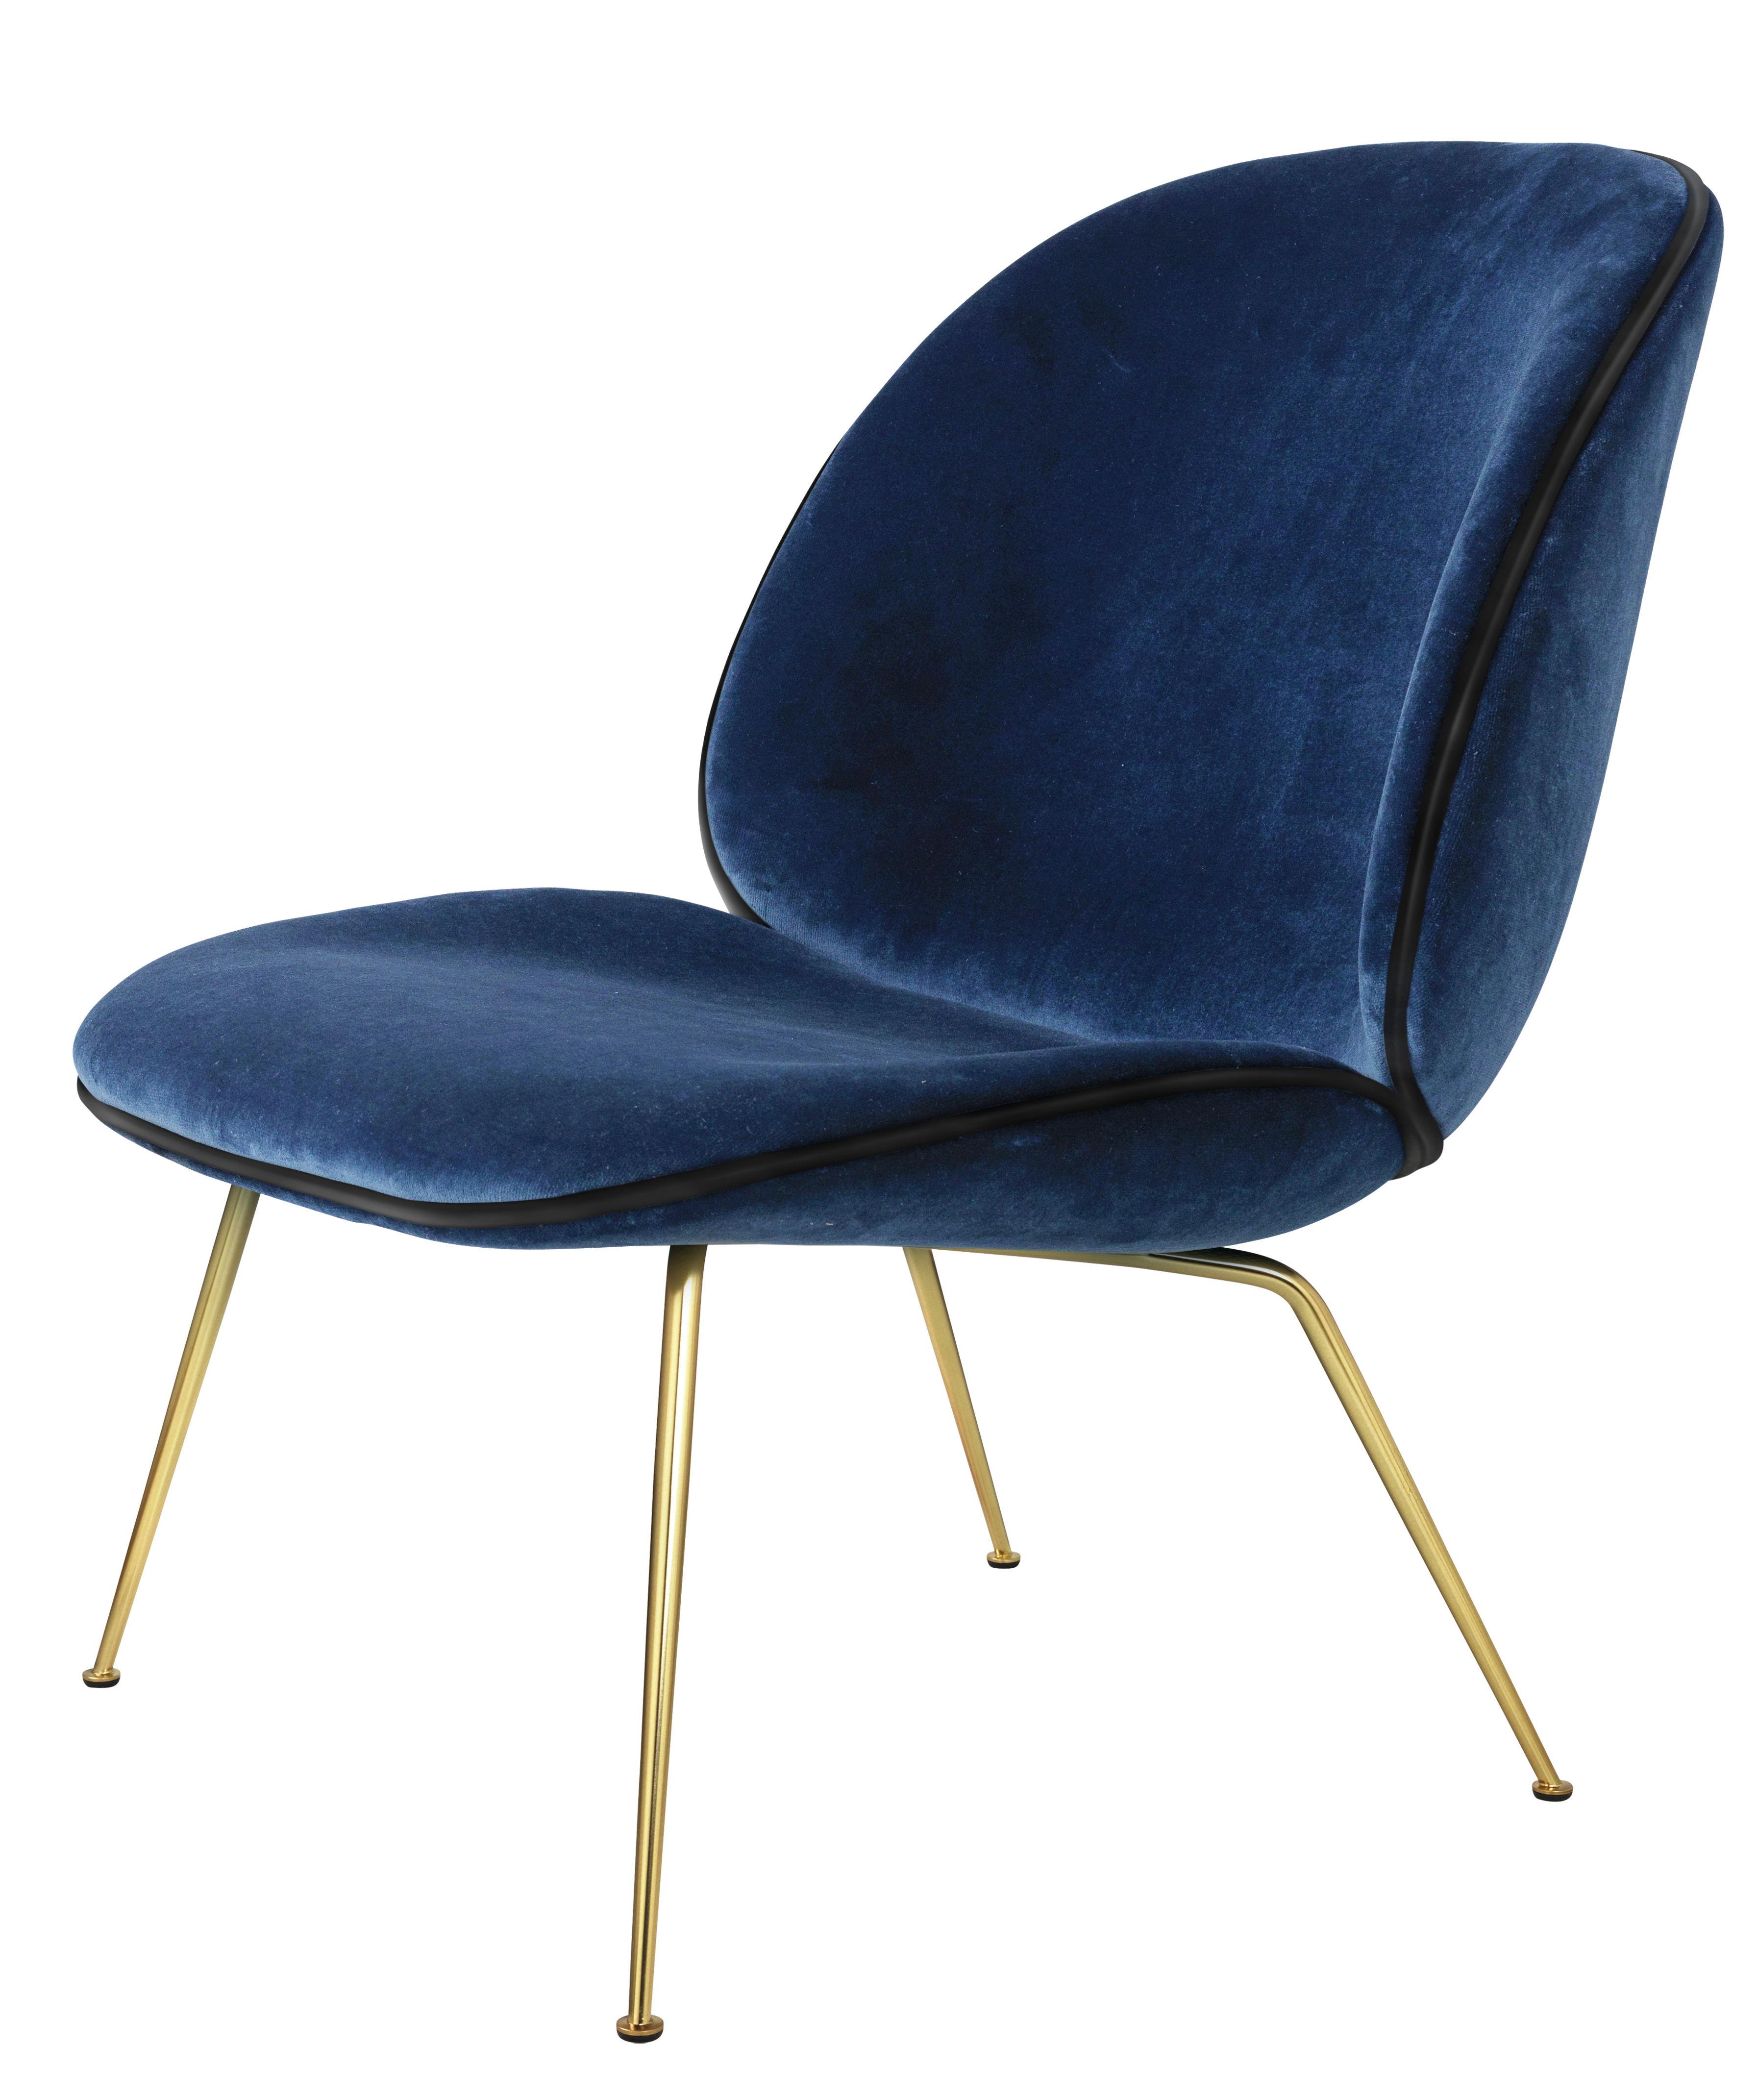 fauteuil bas beetle gamfratesi velours bleu pieds laiton gubi. Black Bedroom Furniture Sets. Home Design Ideas